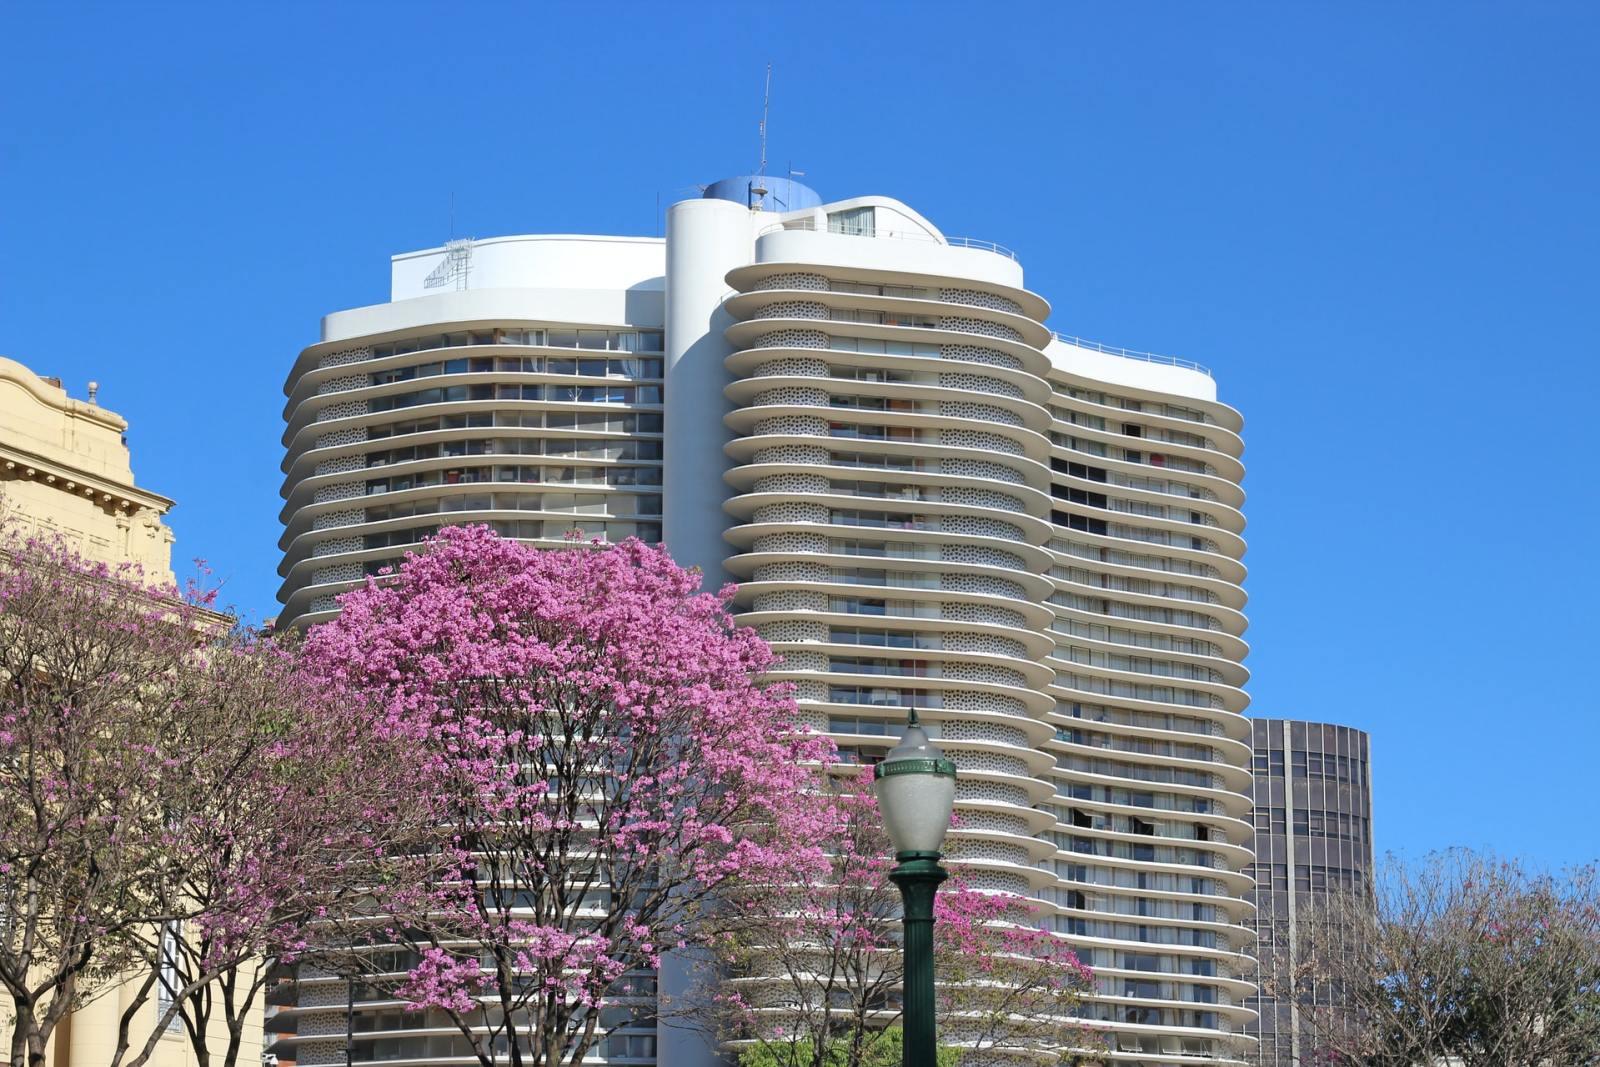 Las mejores zonas donde alojarse en Belo Horizonte, Brasil